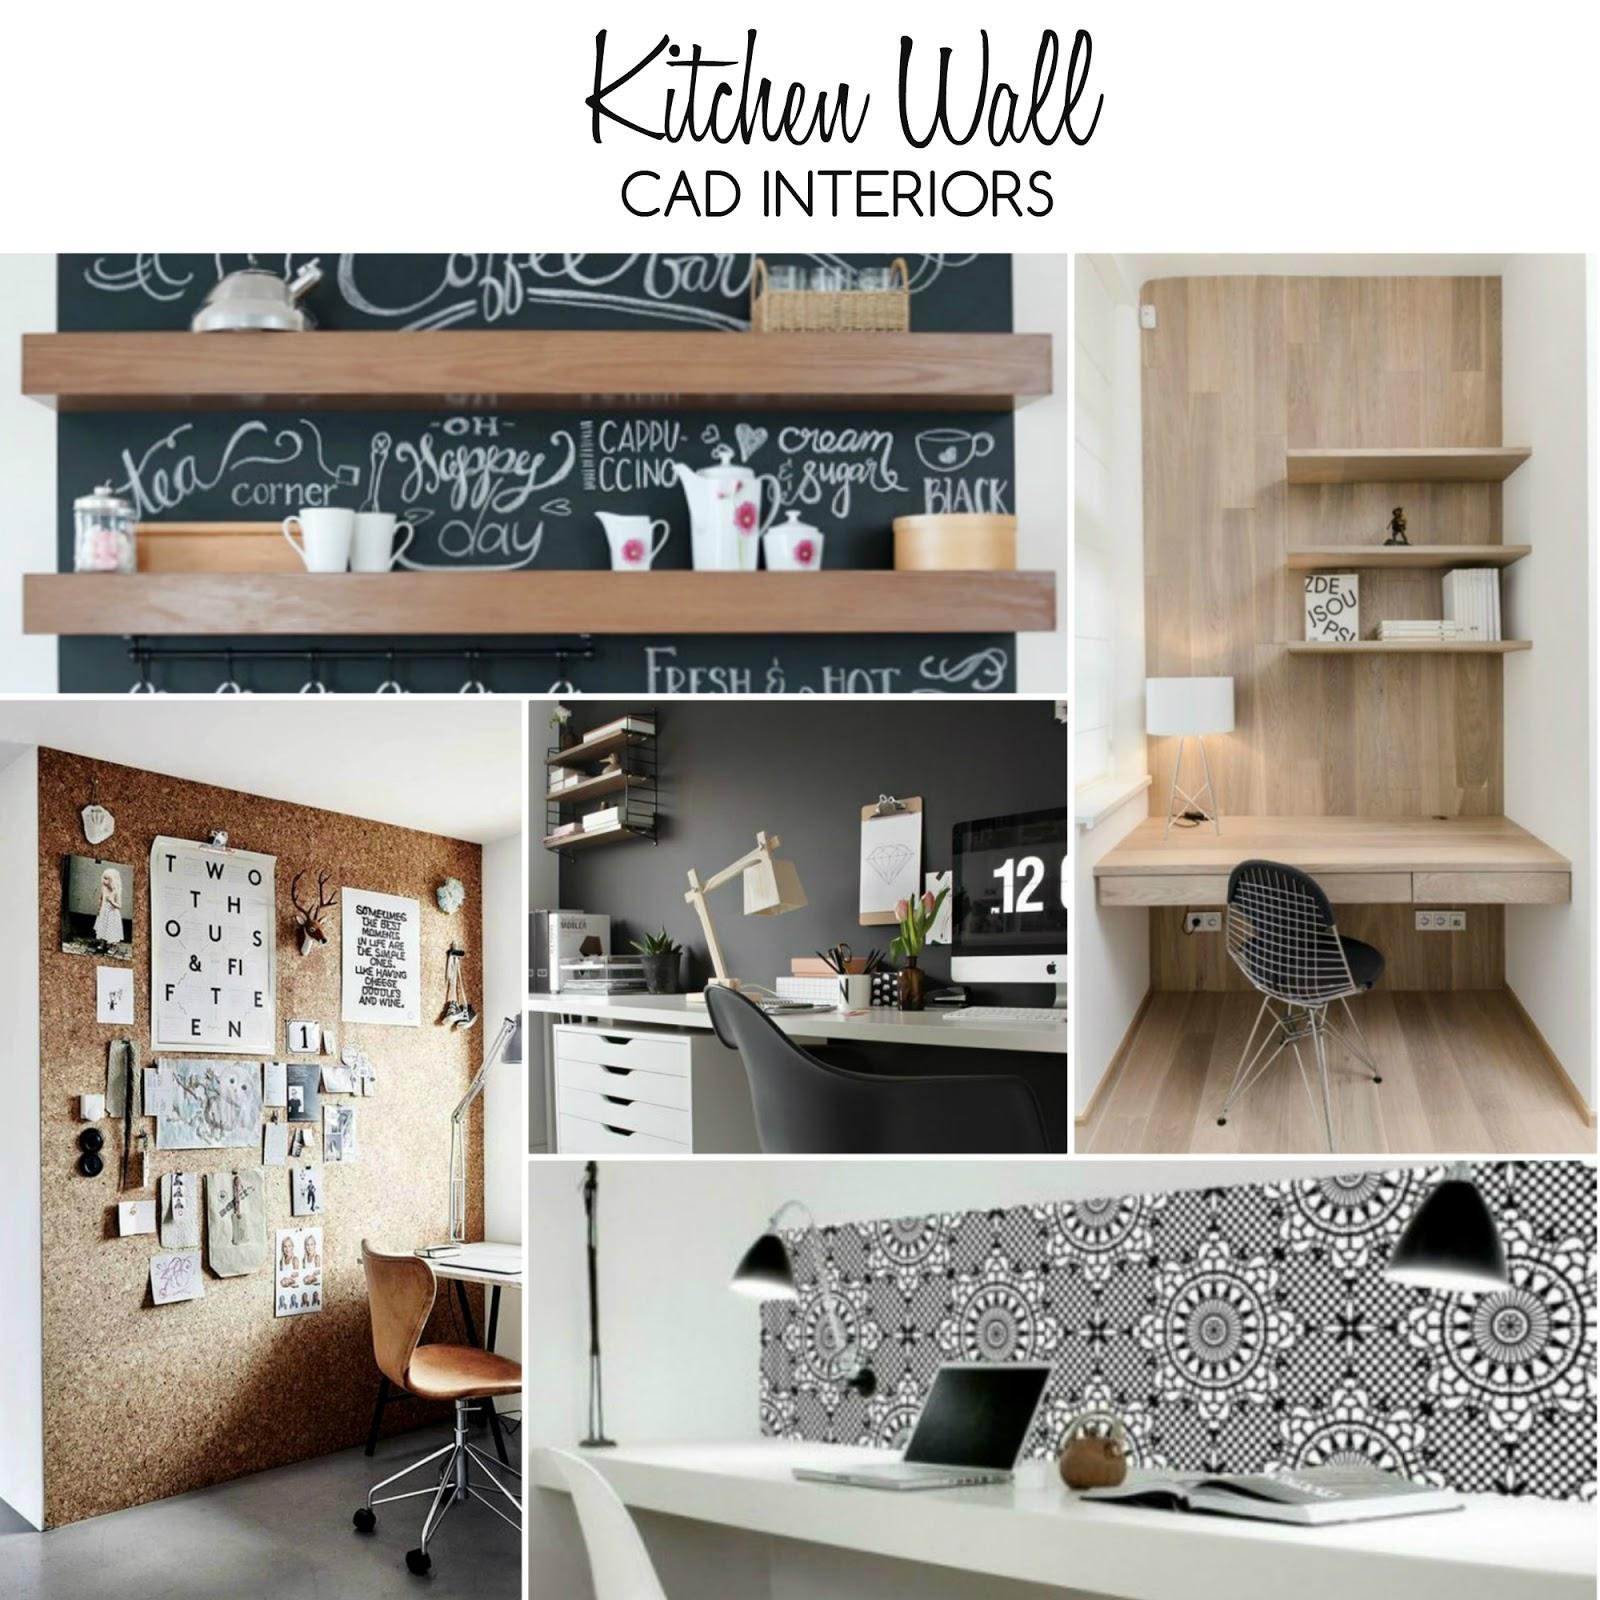 CAD INTERIORS - Affordable stylish interiors